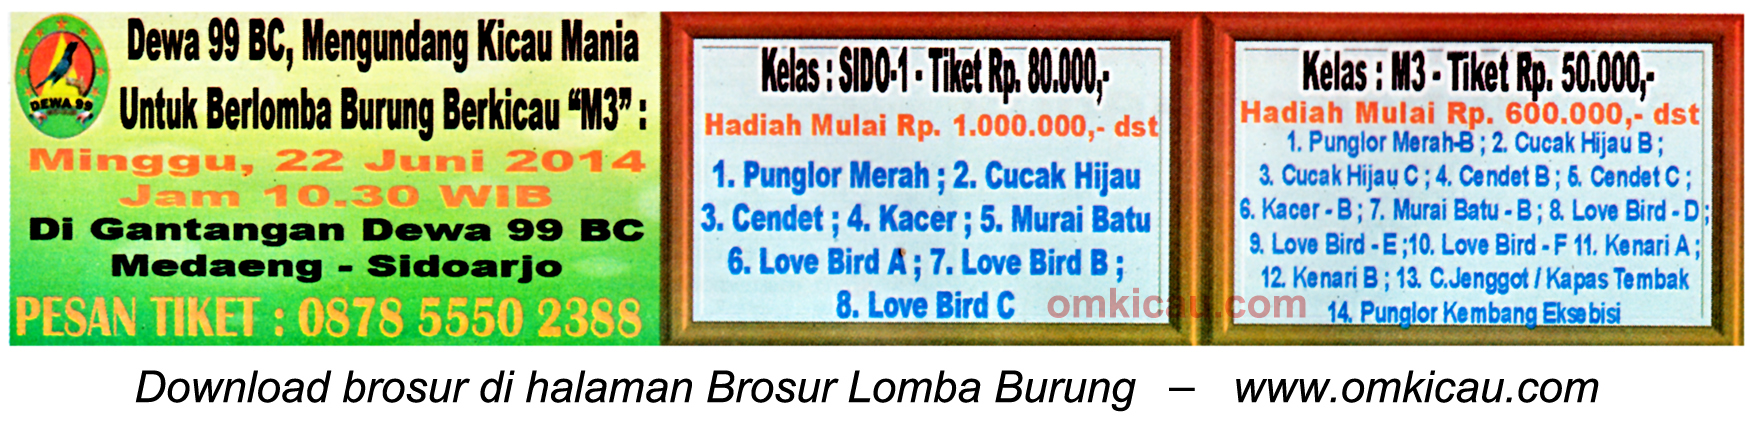 Brosur Lomba Burung Berkicau M3-Dewa 99 BC, Sidoarjo, 22 Juni 2014